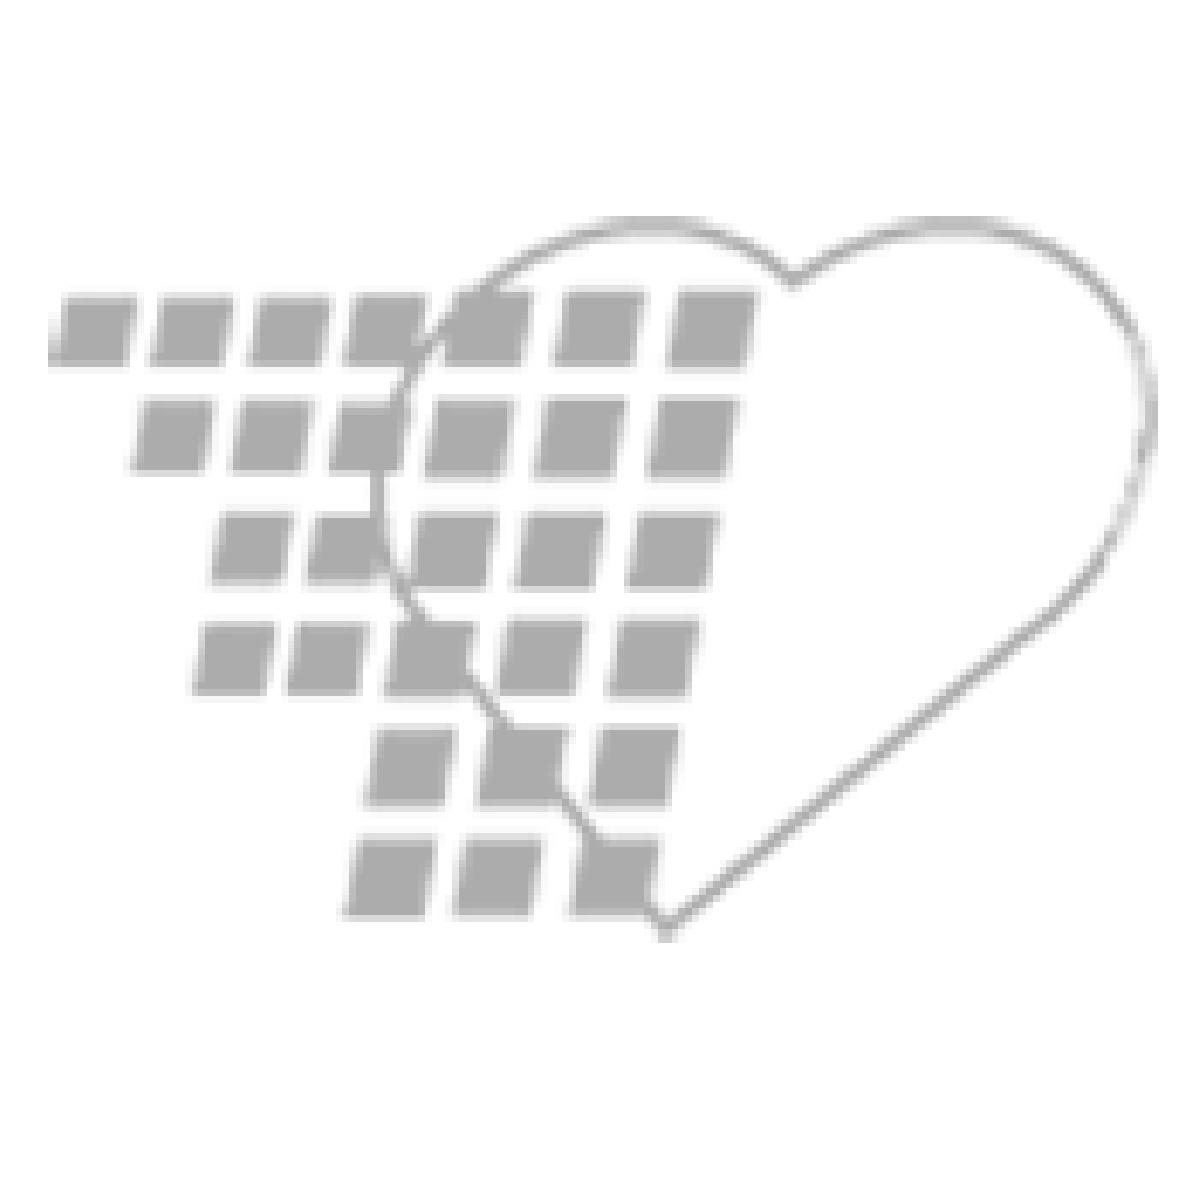 01-77-1096 Dental Assistant Pin